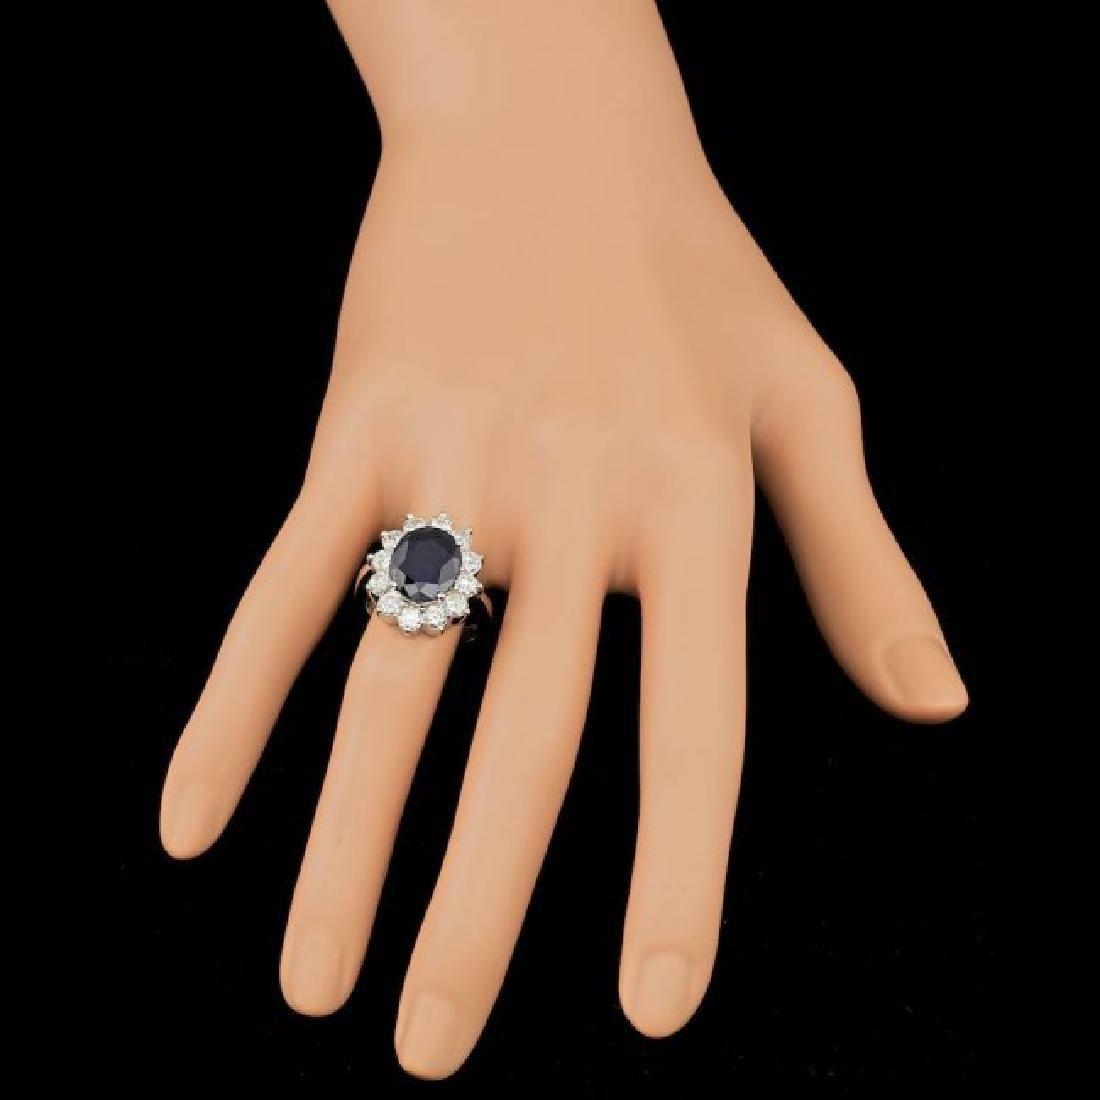 14k Gold 5.00ct Sapphire 2.50ct Diamond Ring - 3